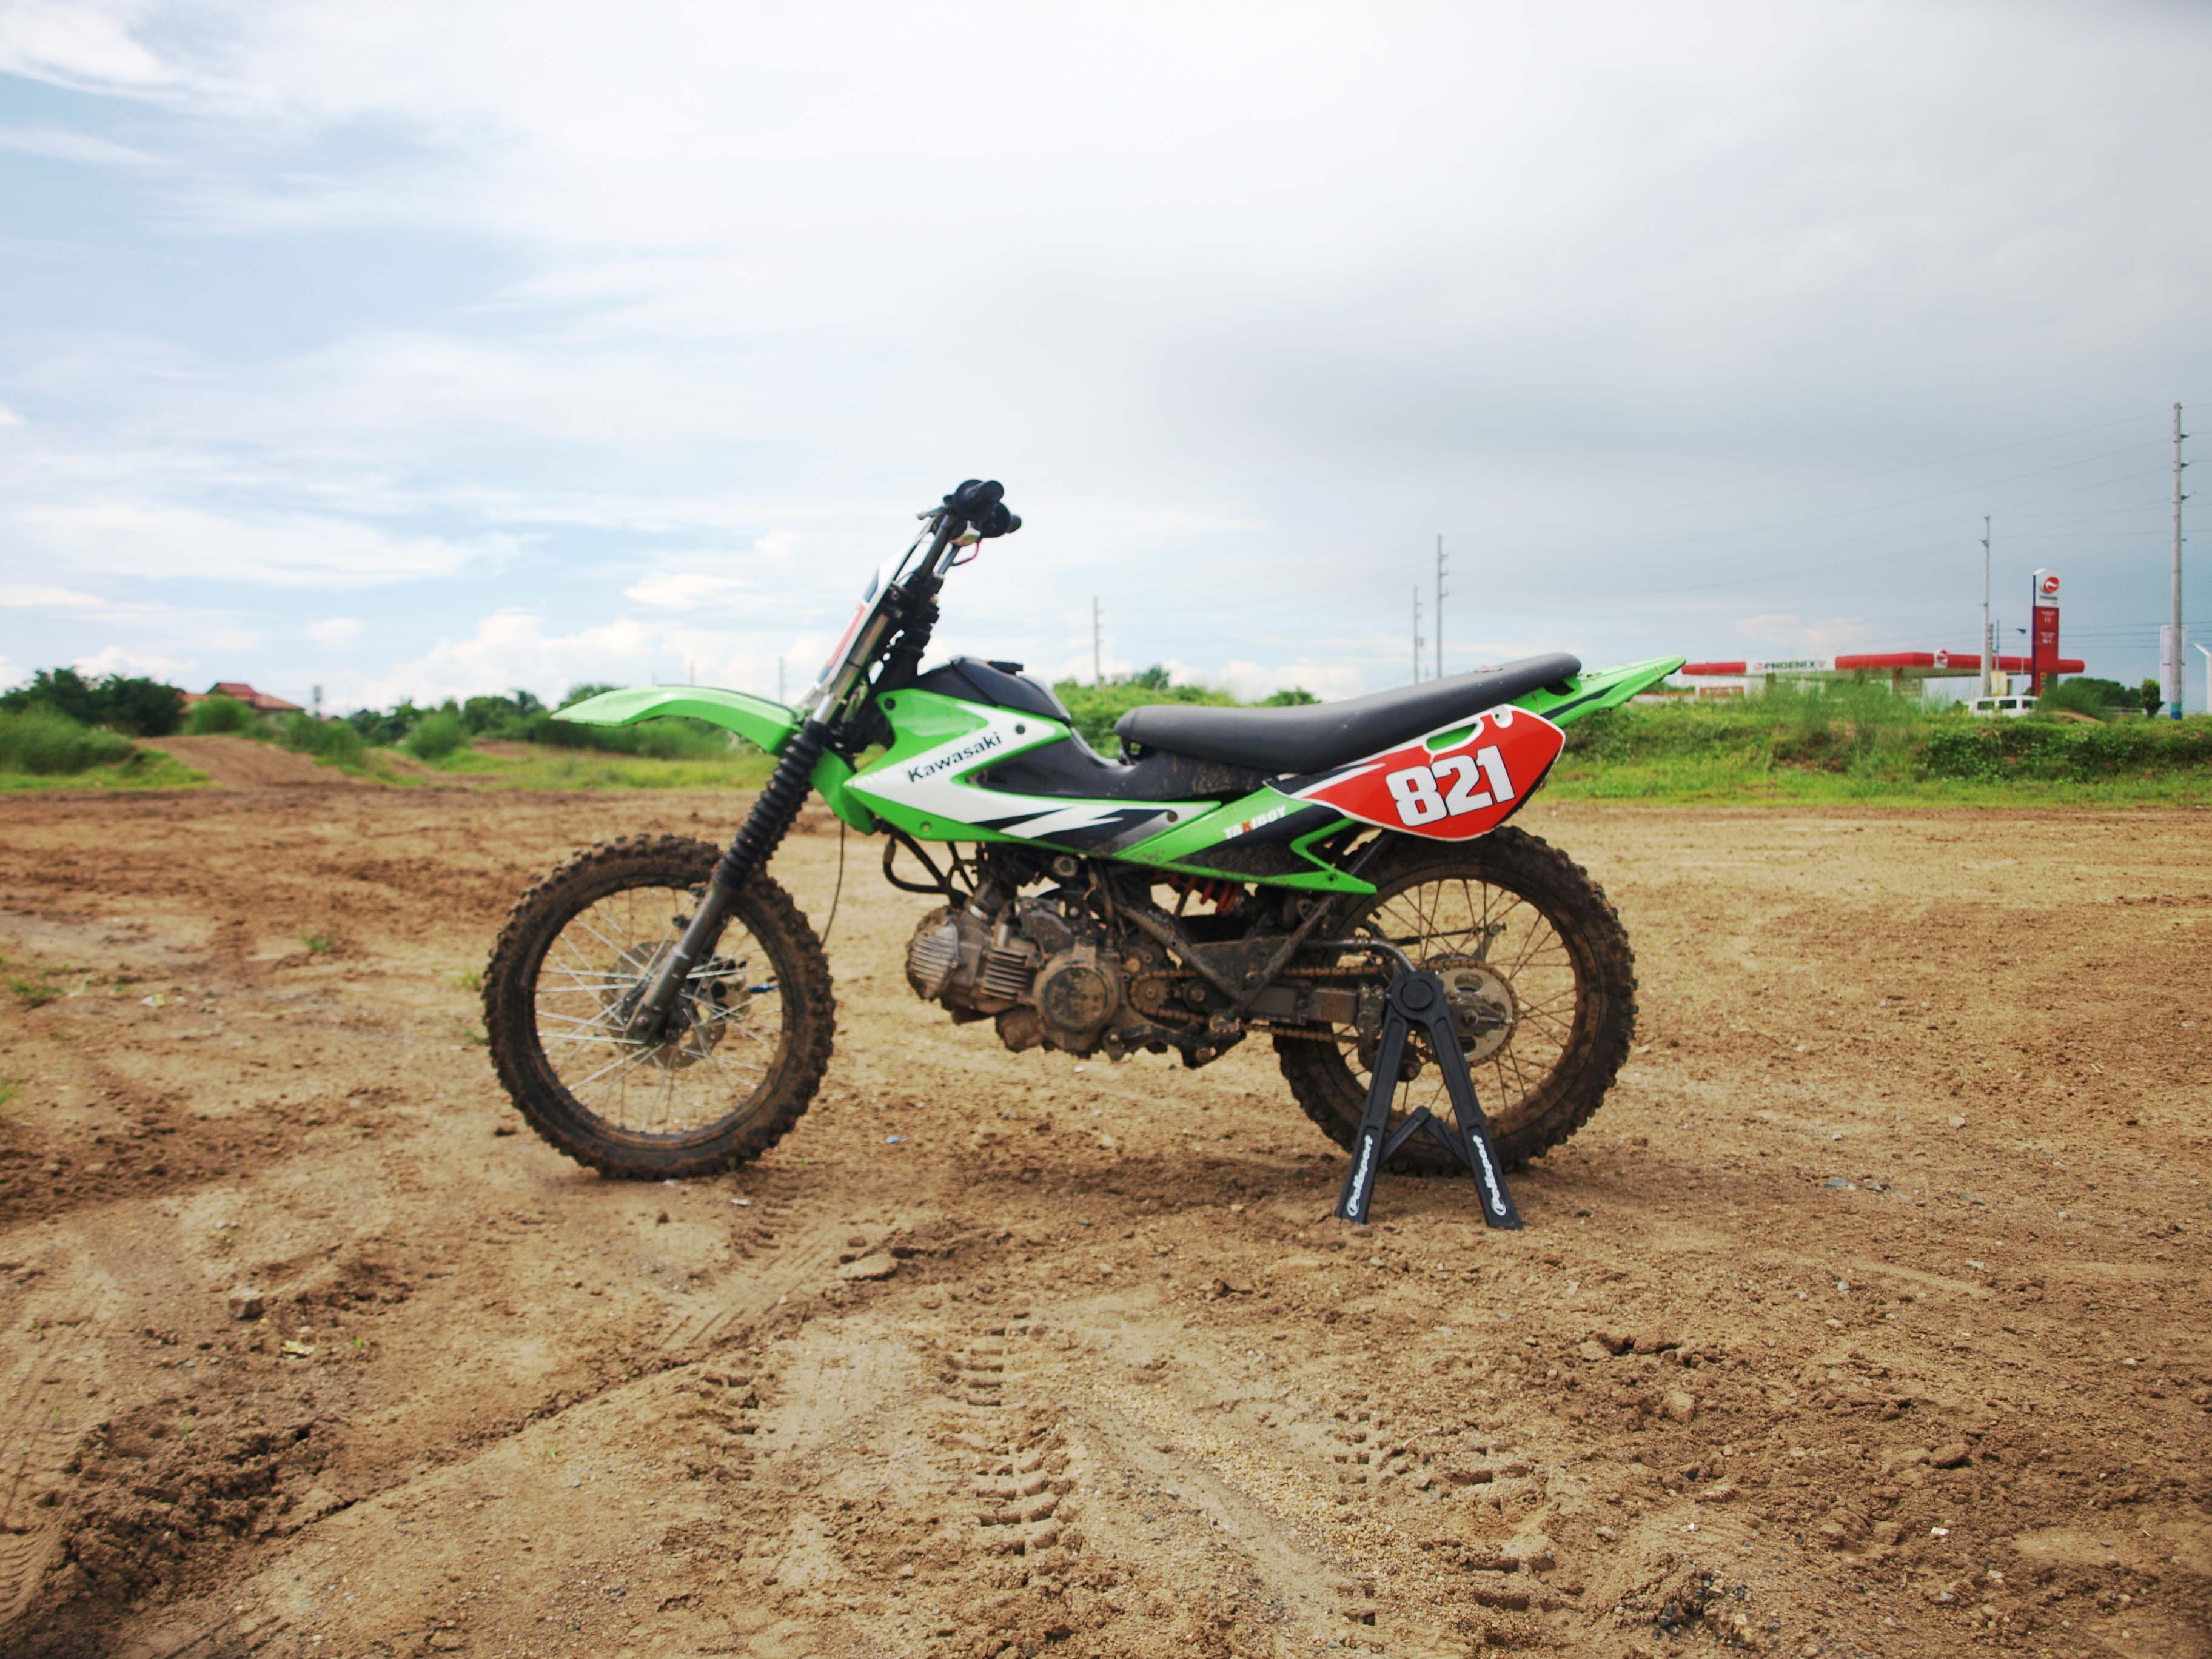 Kawasaki Fury 125 Dirt Bike Inside Racing